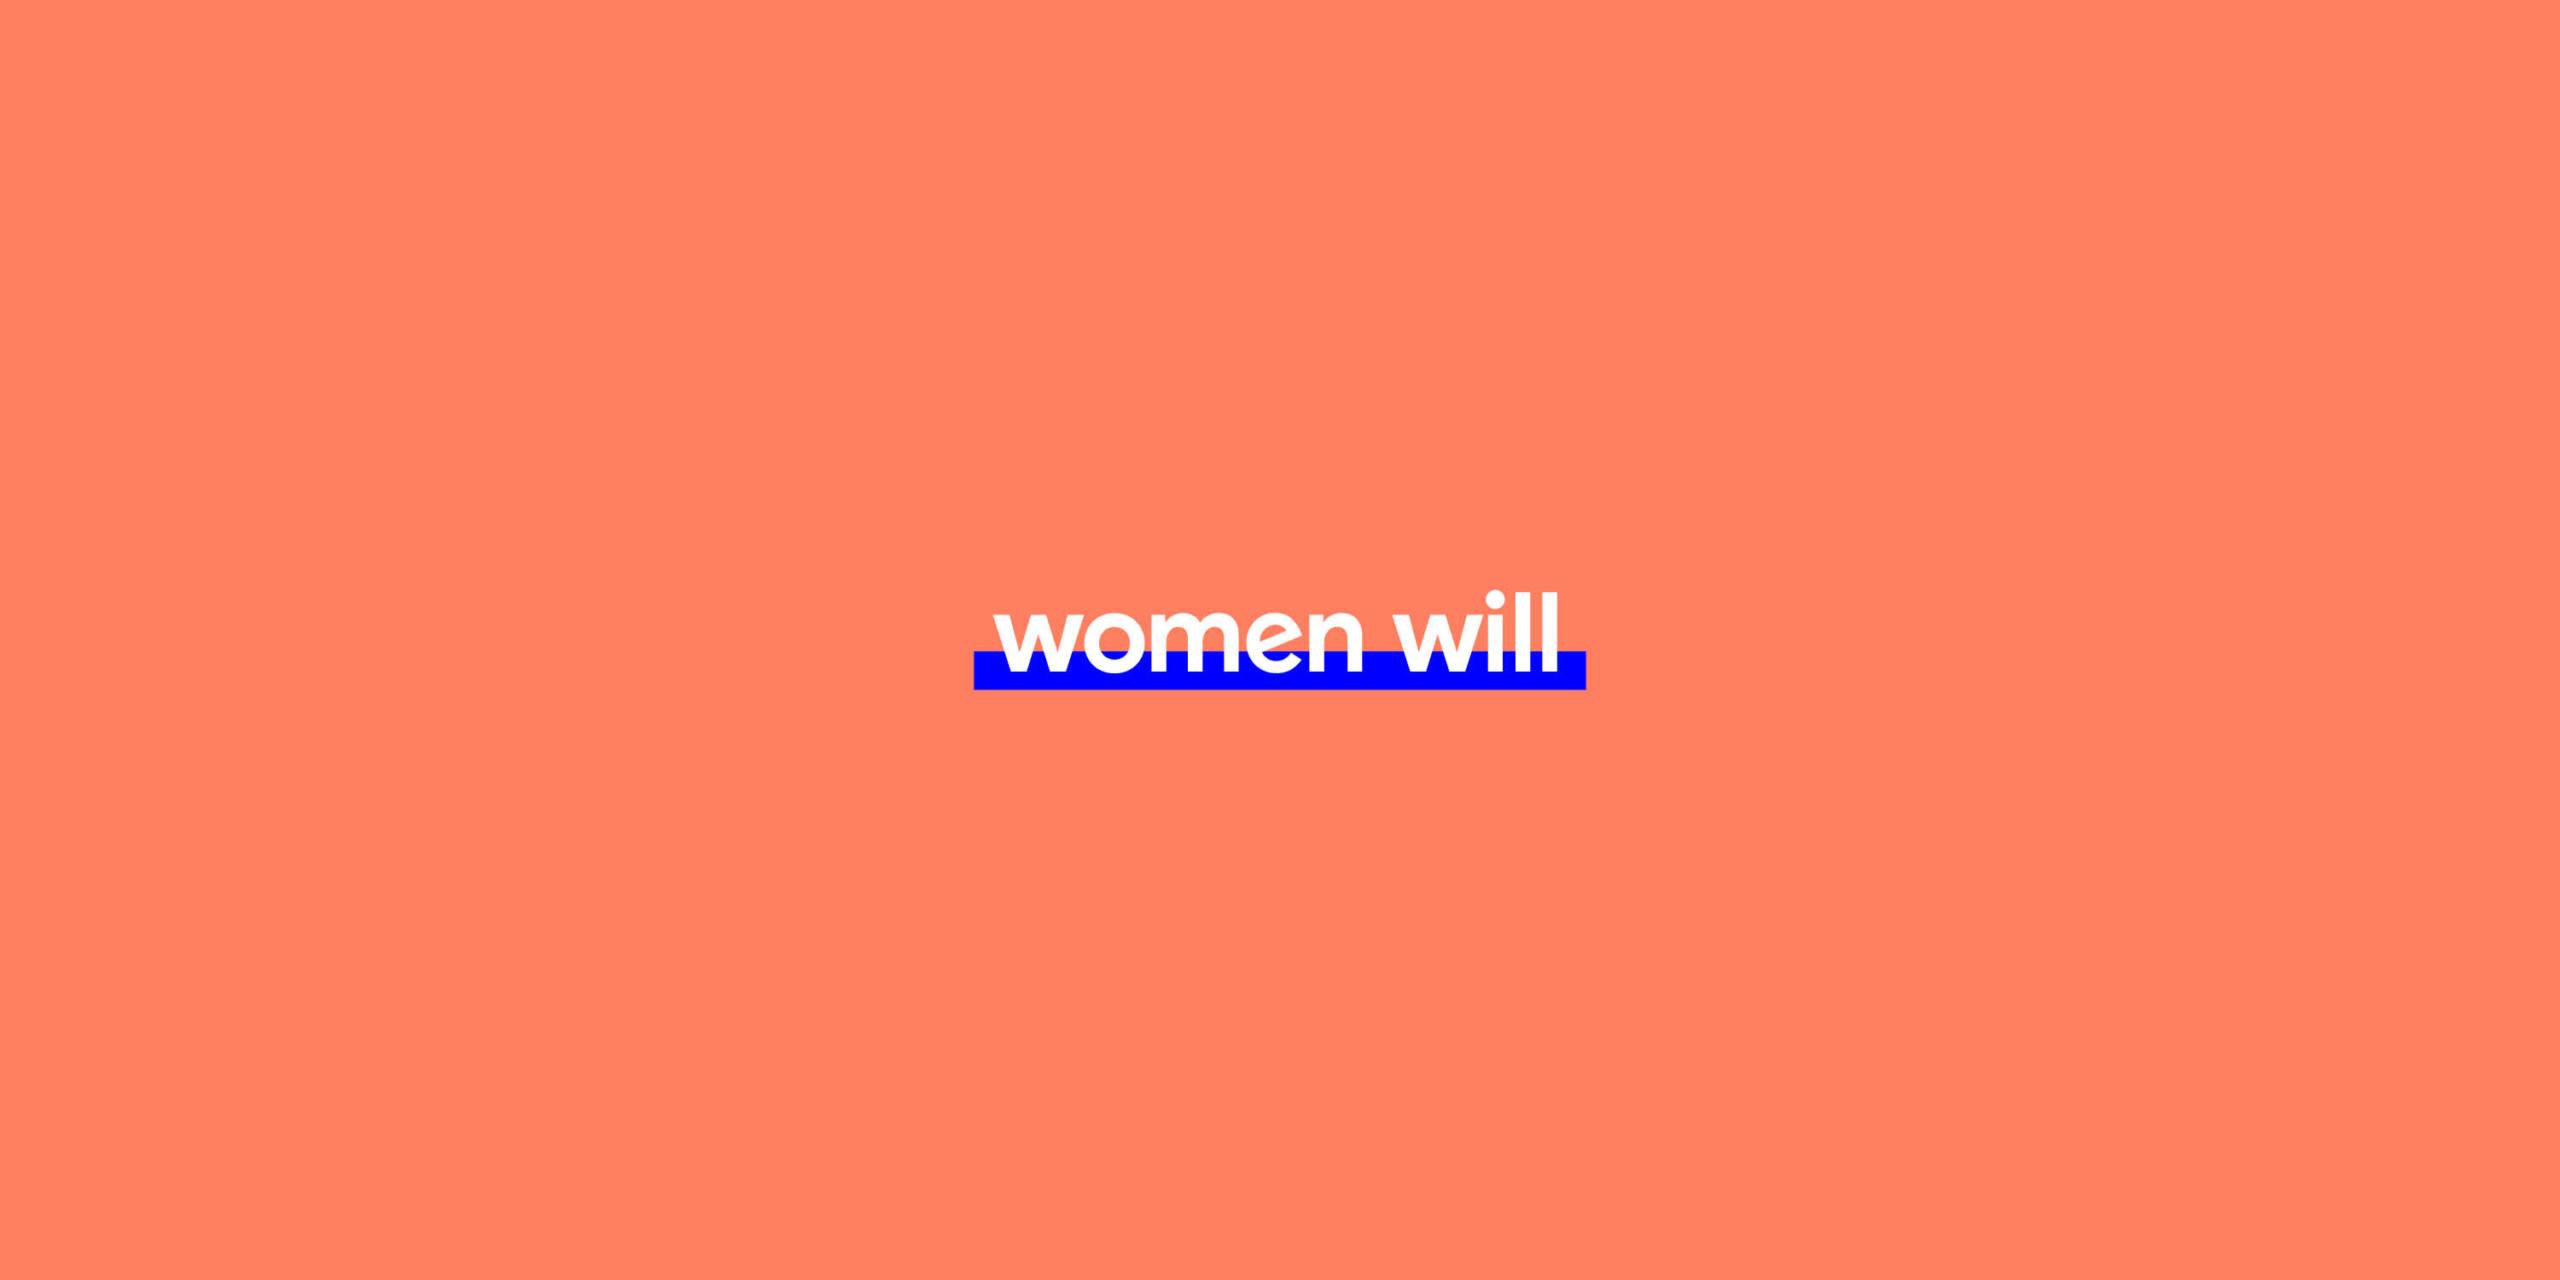 Womenwillbanner